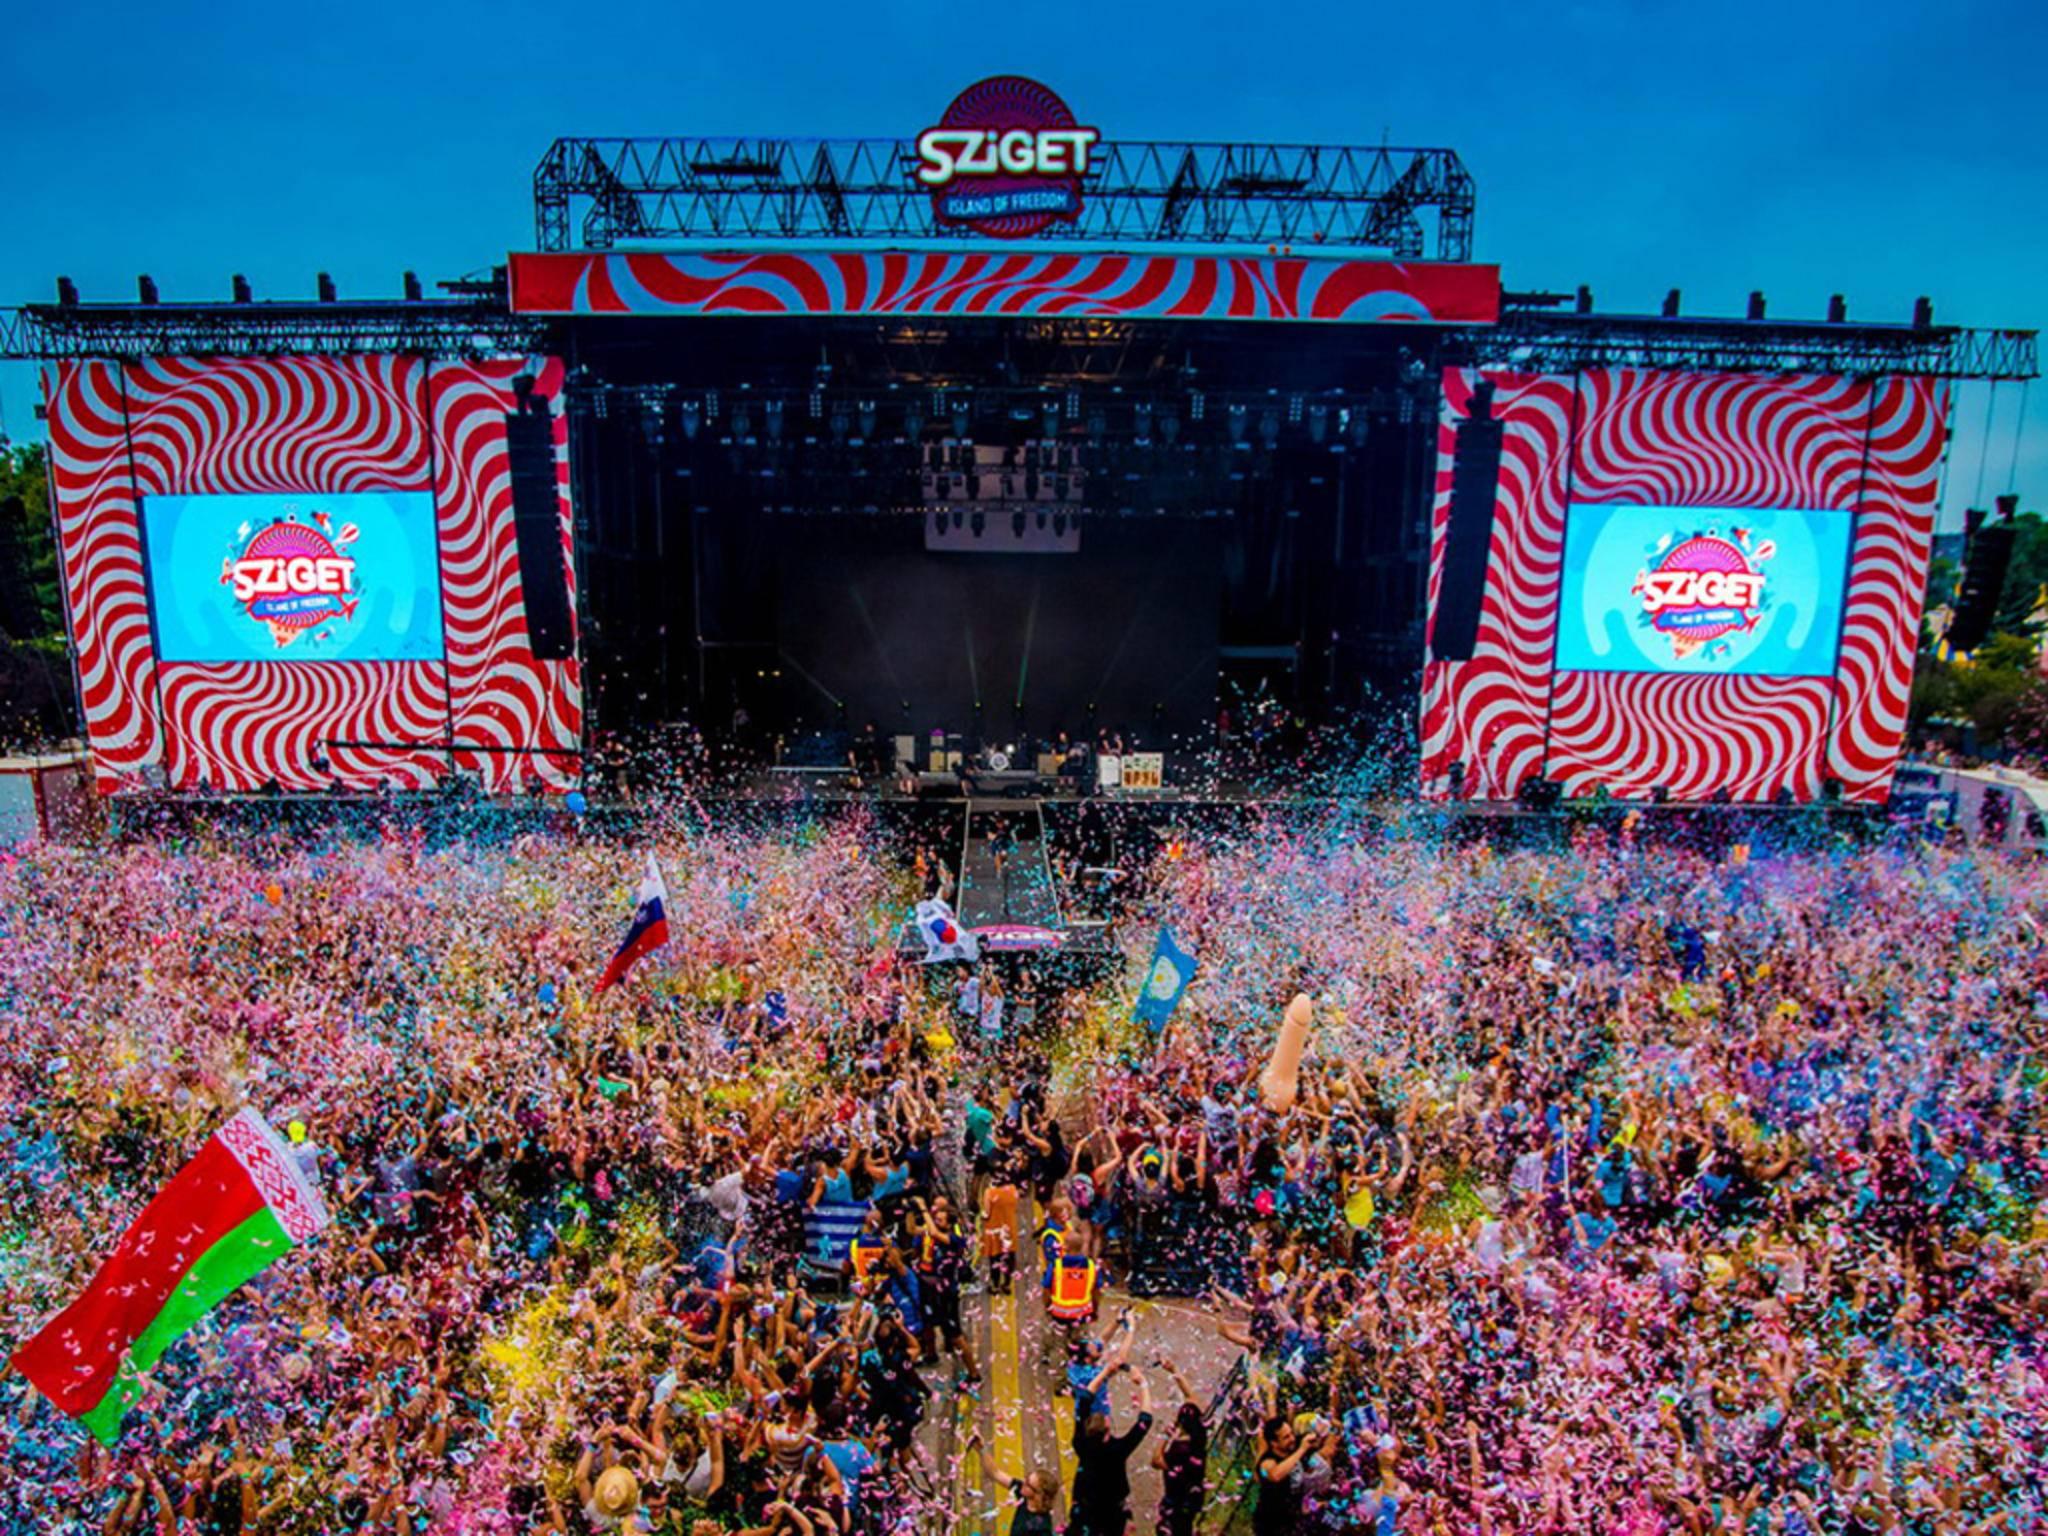 sziget 2016 festival